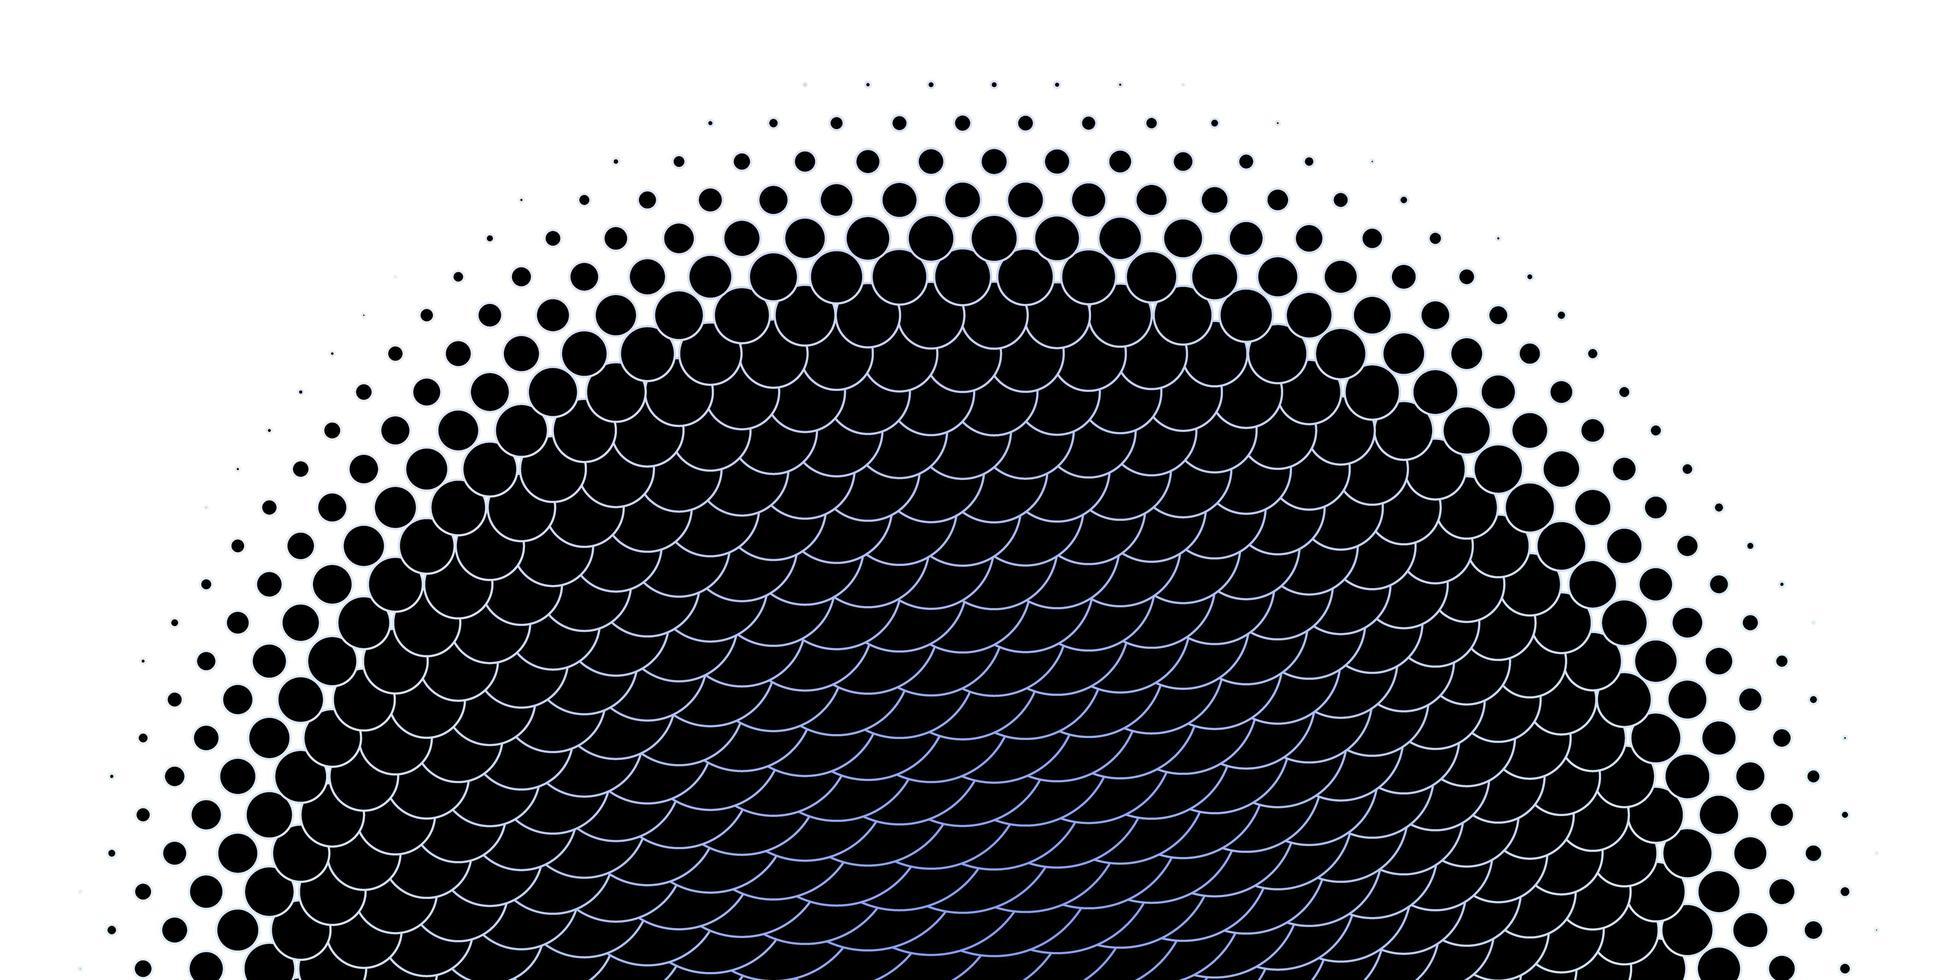 layout de vetor roxo claro com formas de círculo.